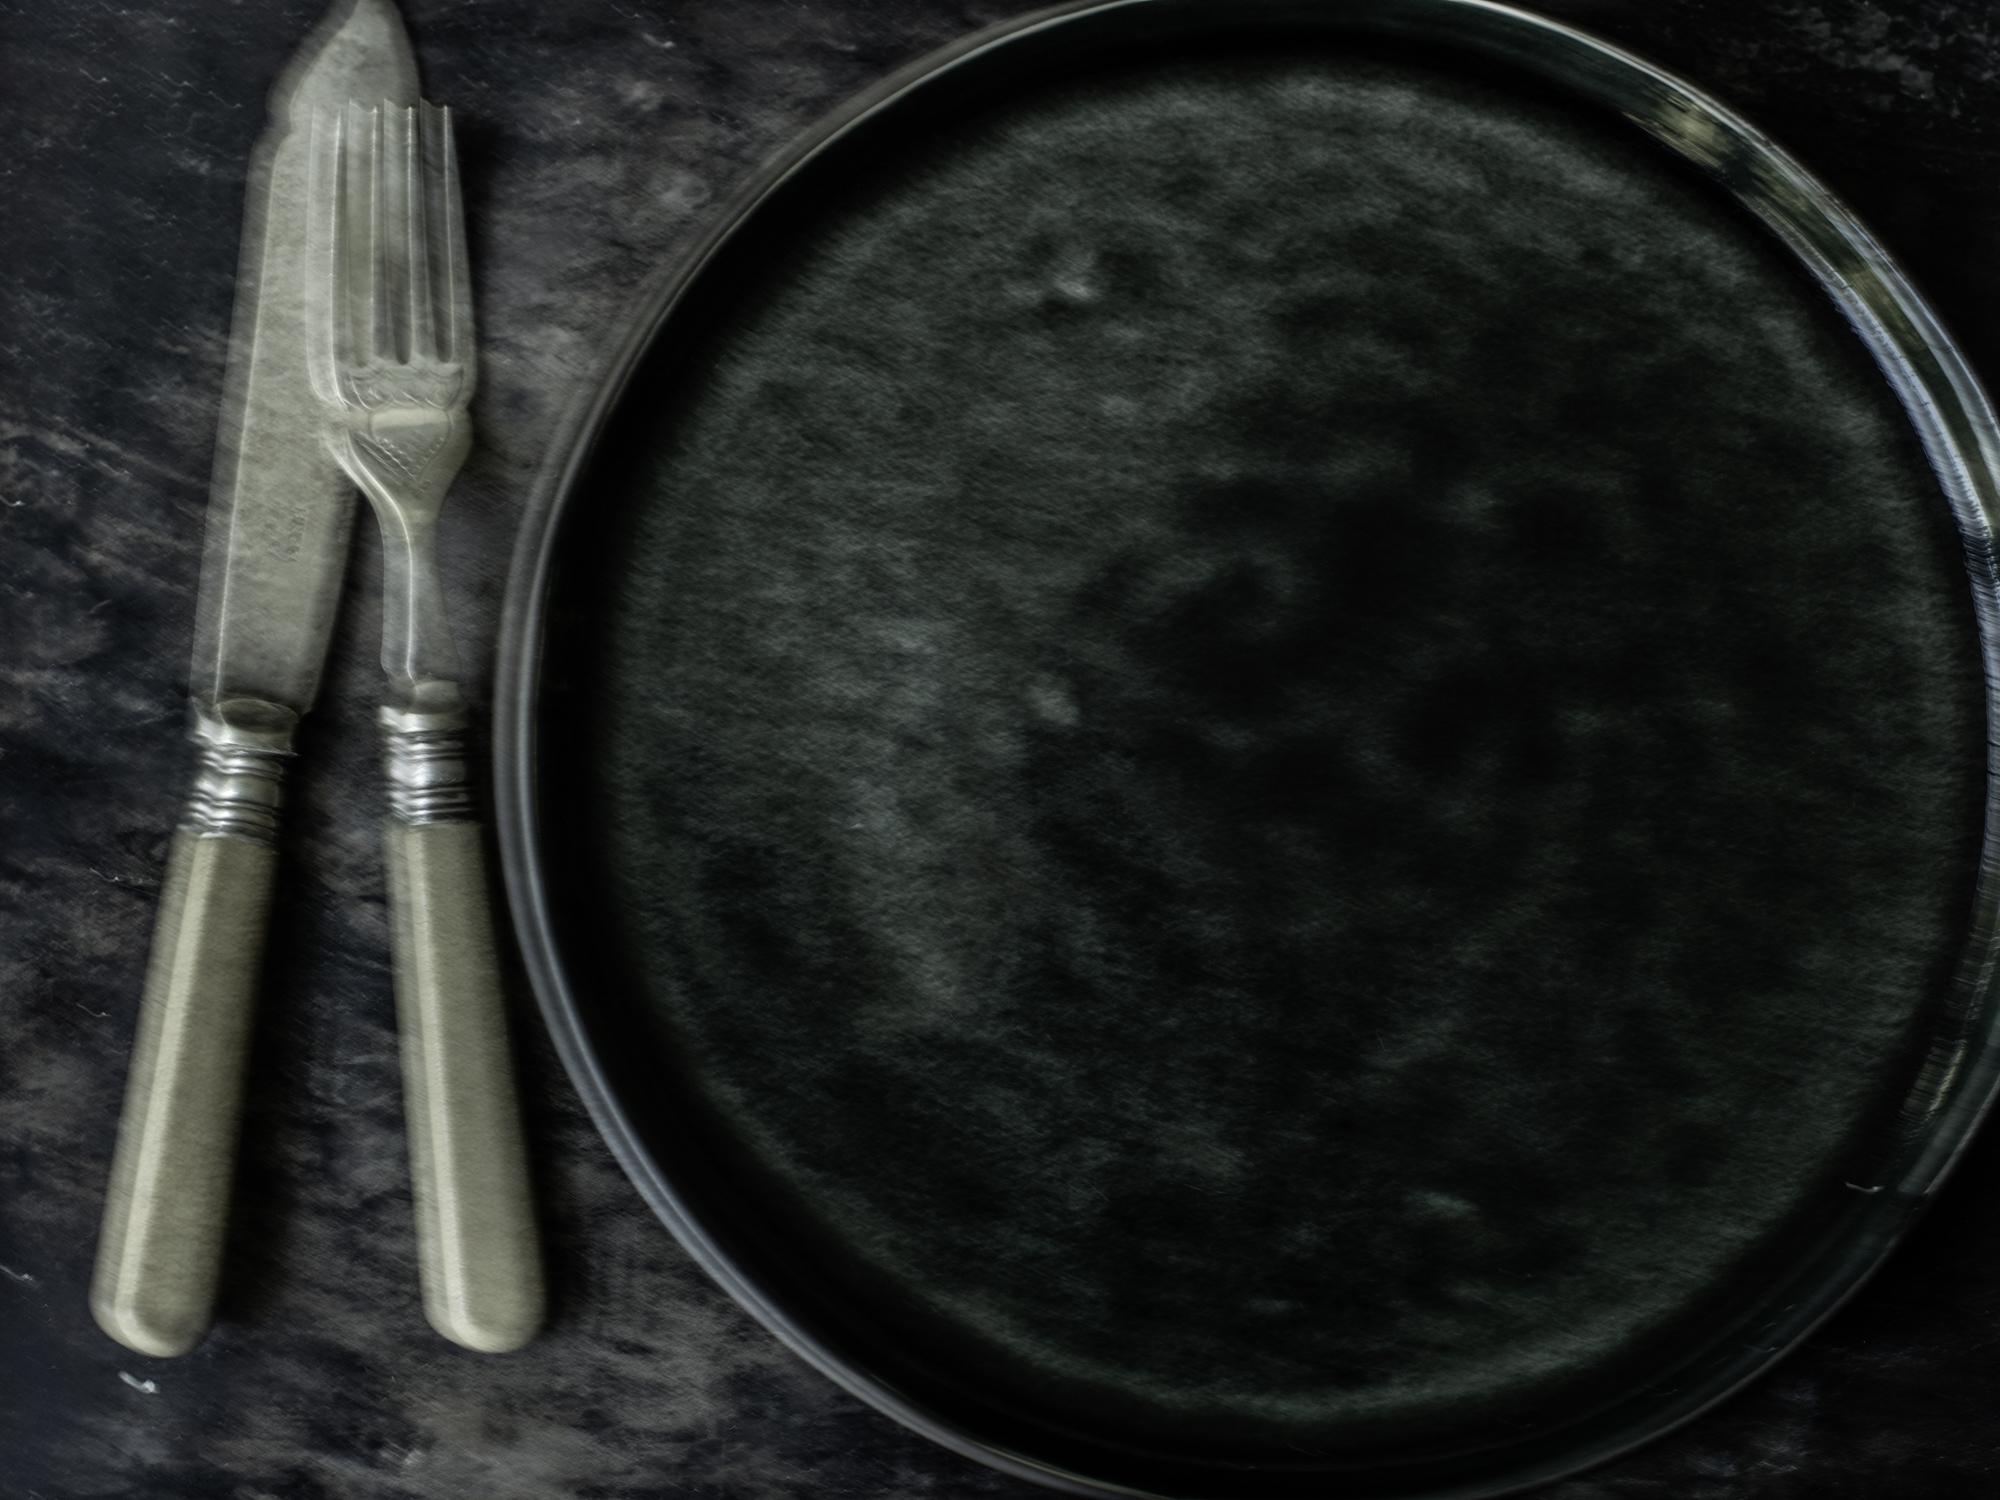 Food-Fotografie Meatlove, Stefan Schmidlin Fotograf Basel; Bild 27.jpg